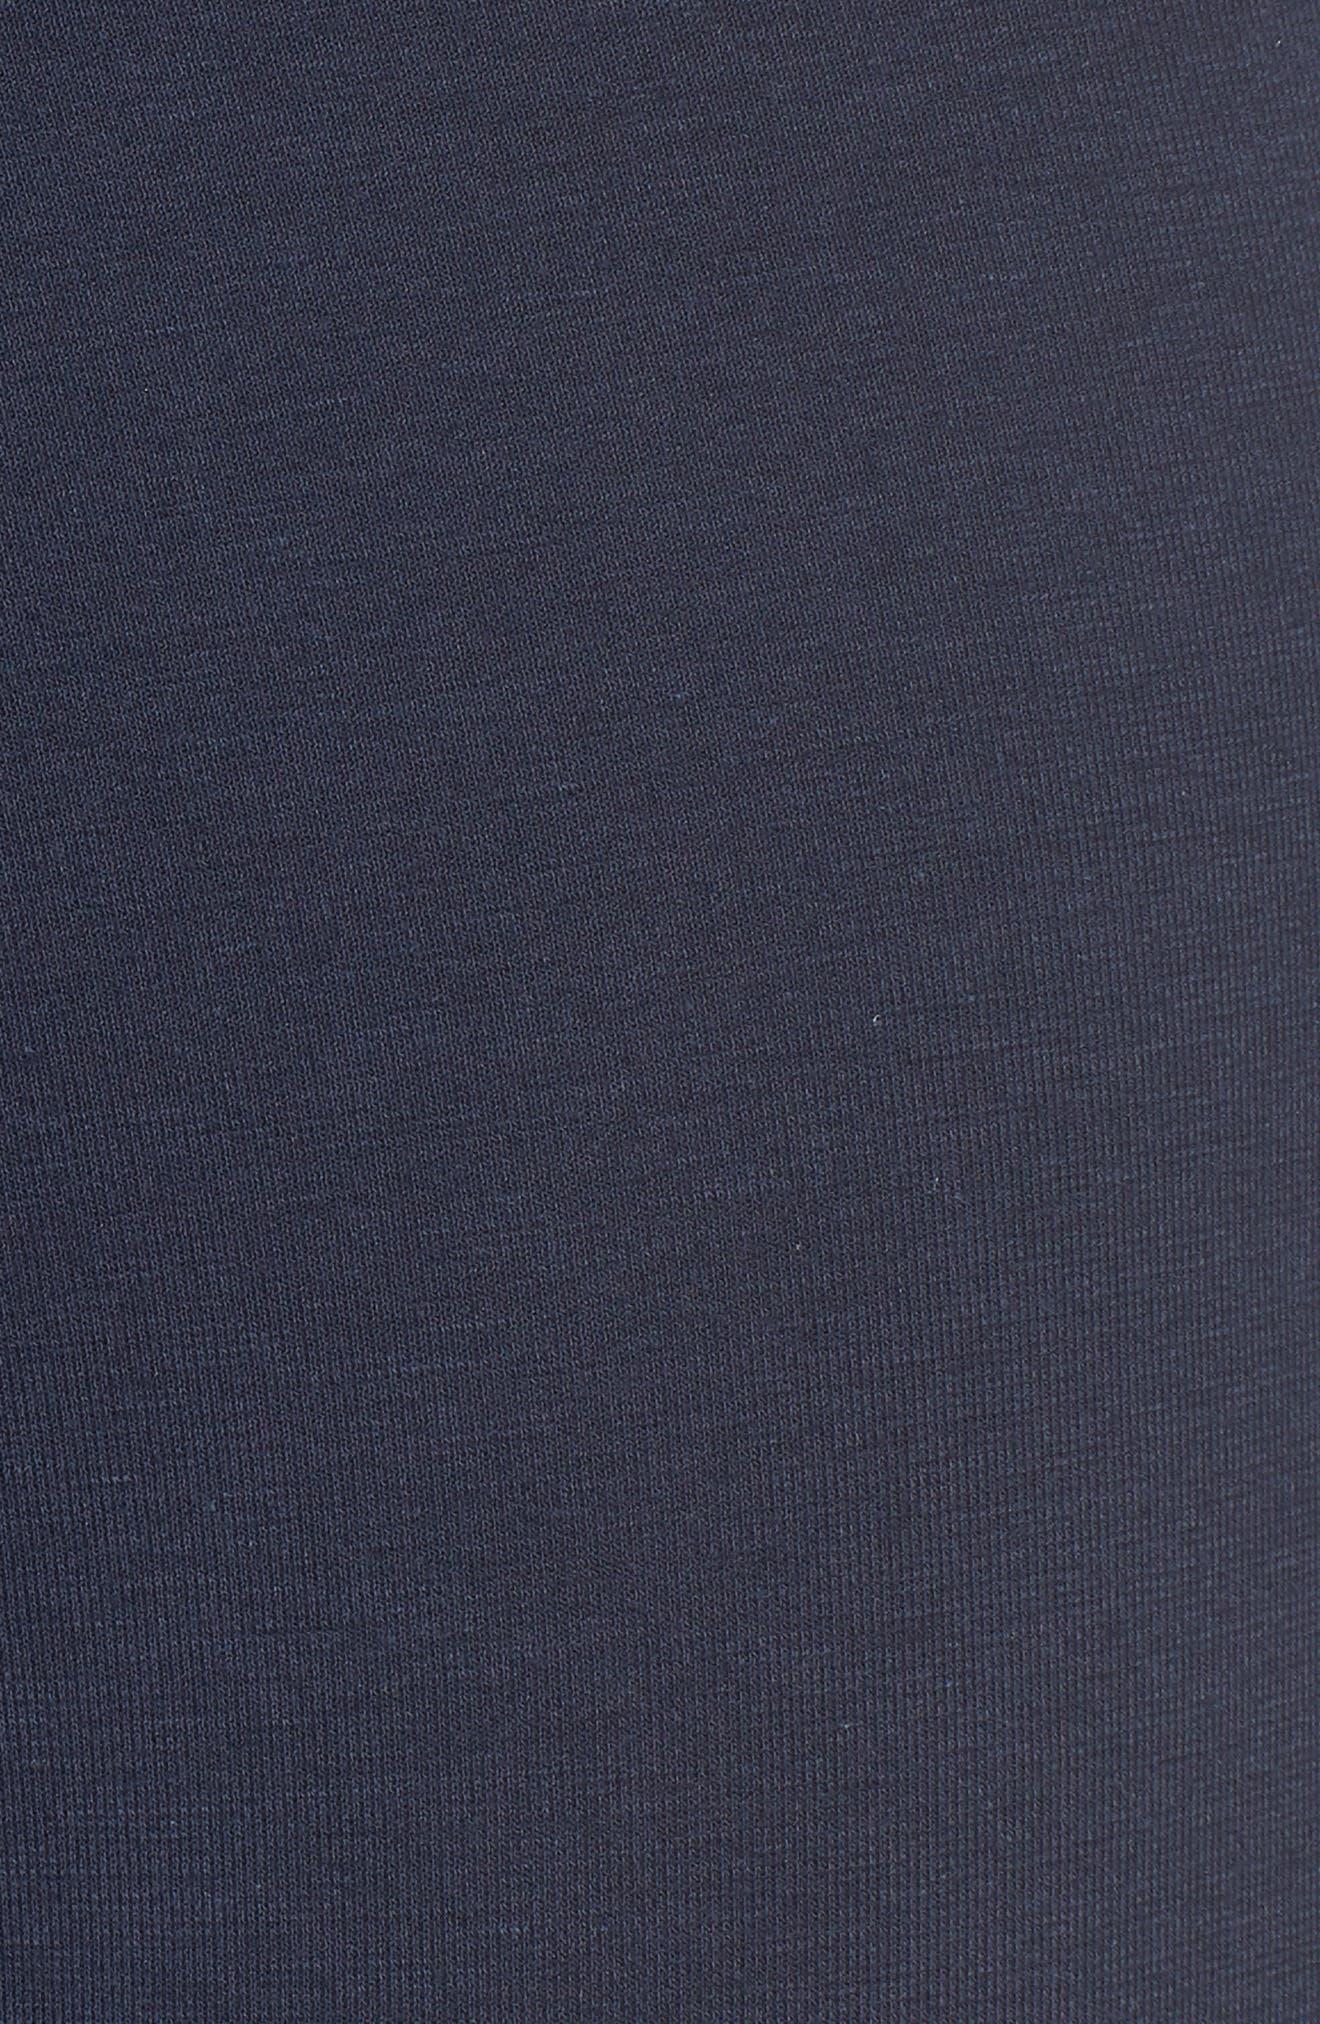 Infinity Cotton Blend Boxer Briefs,                             Alternate thumbnail 5, color,                             NAVY